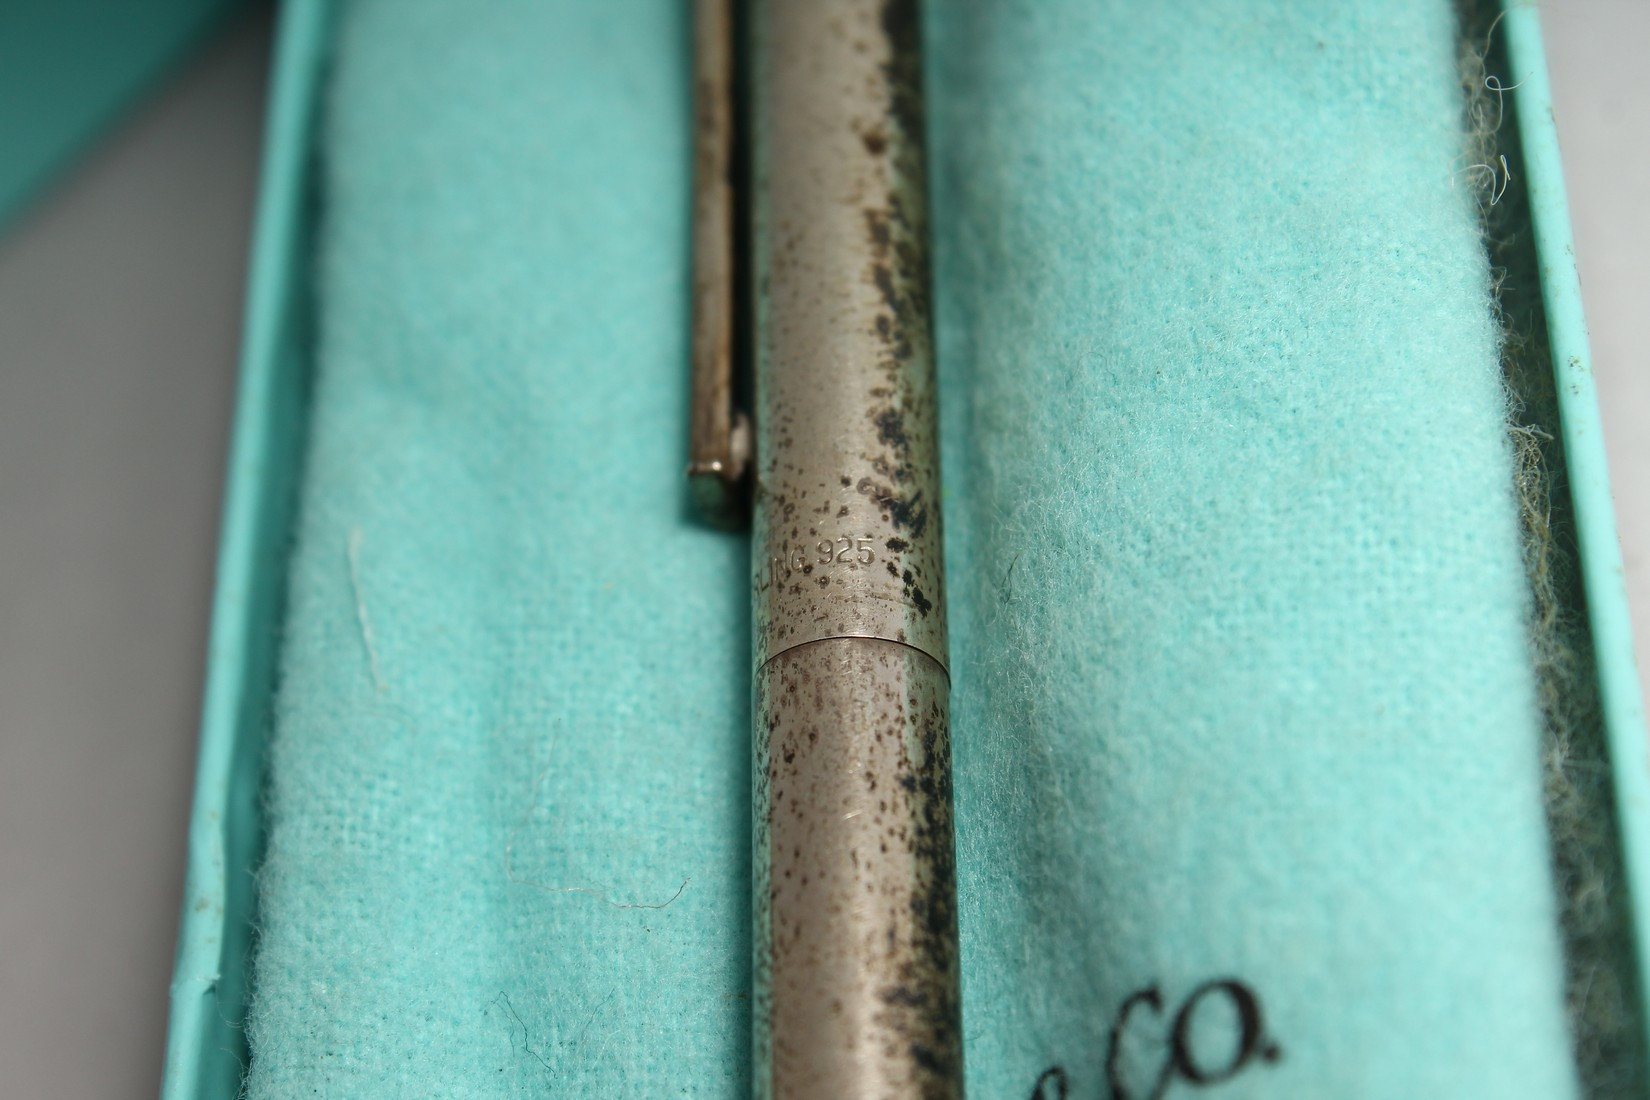 A TIFFANY SILVER PEN in a Tiffany box. - Image 4 of 4